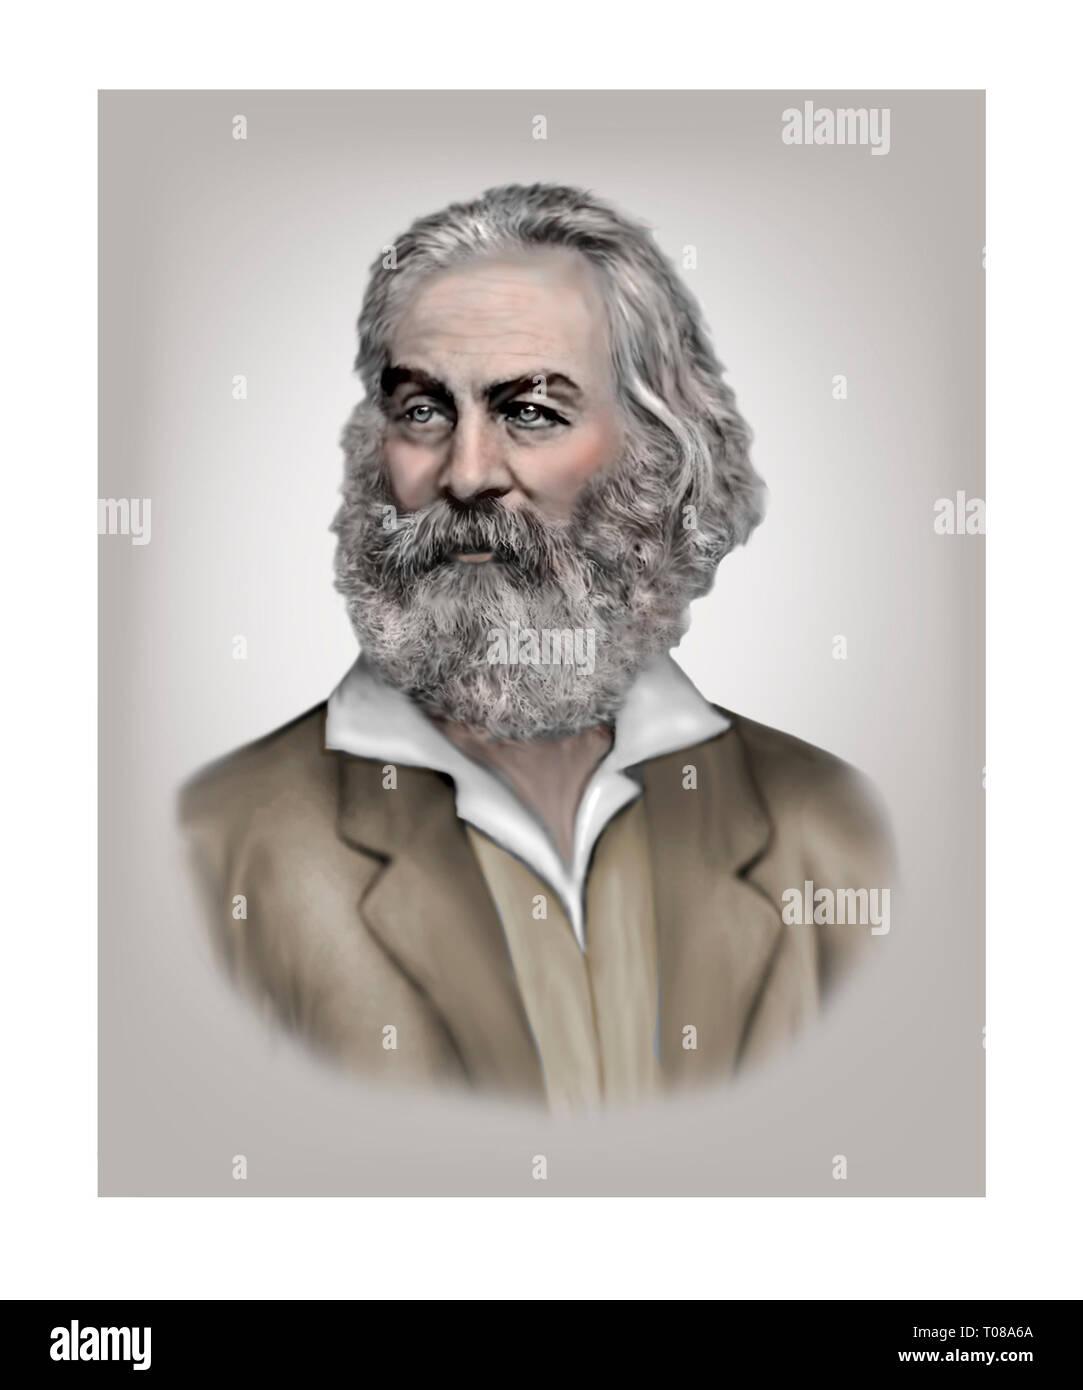 Walt Whitman poeta americano 1819-1892 ensayista periodista Foto de stock